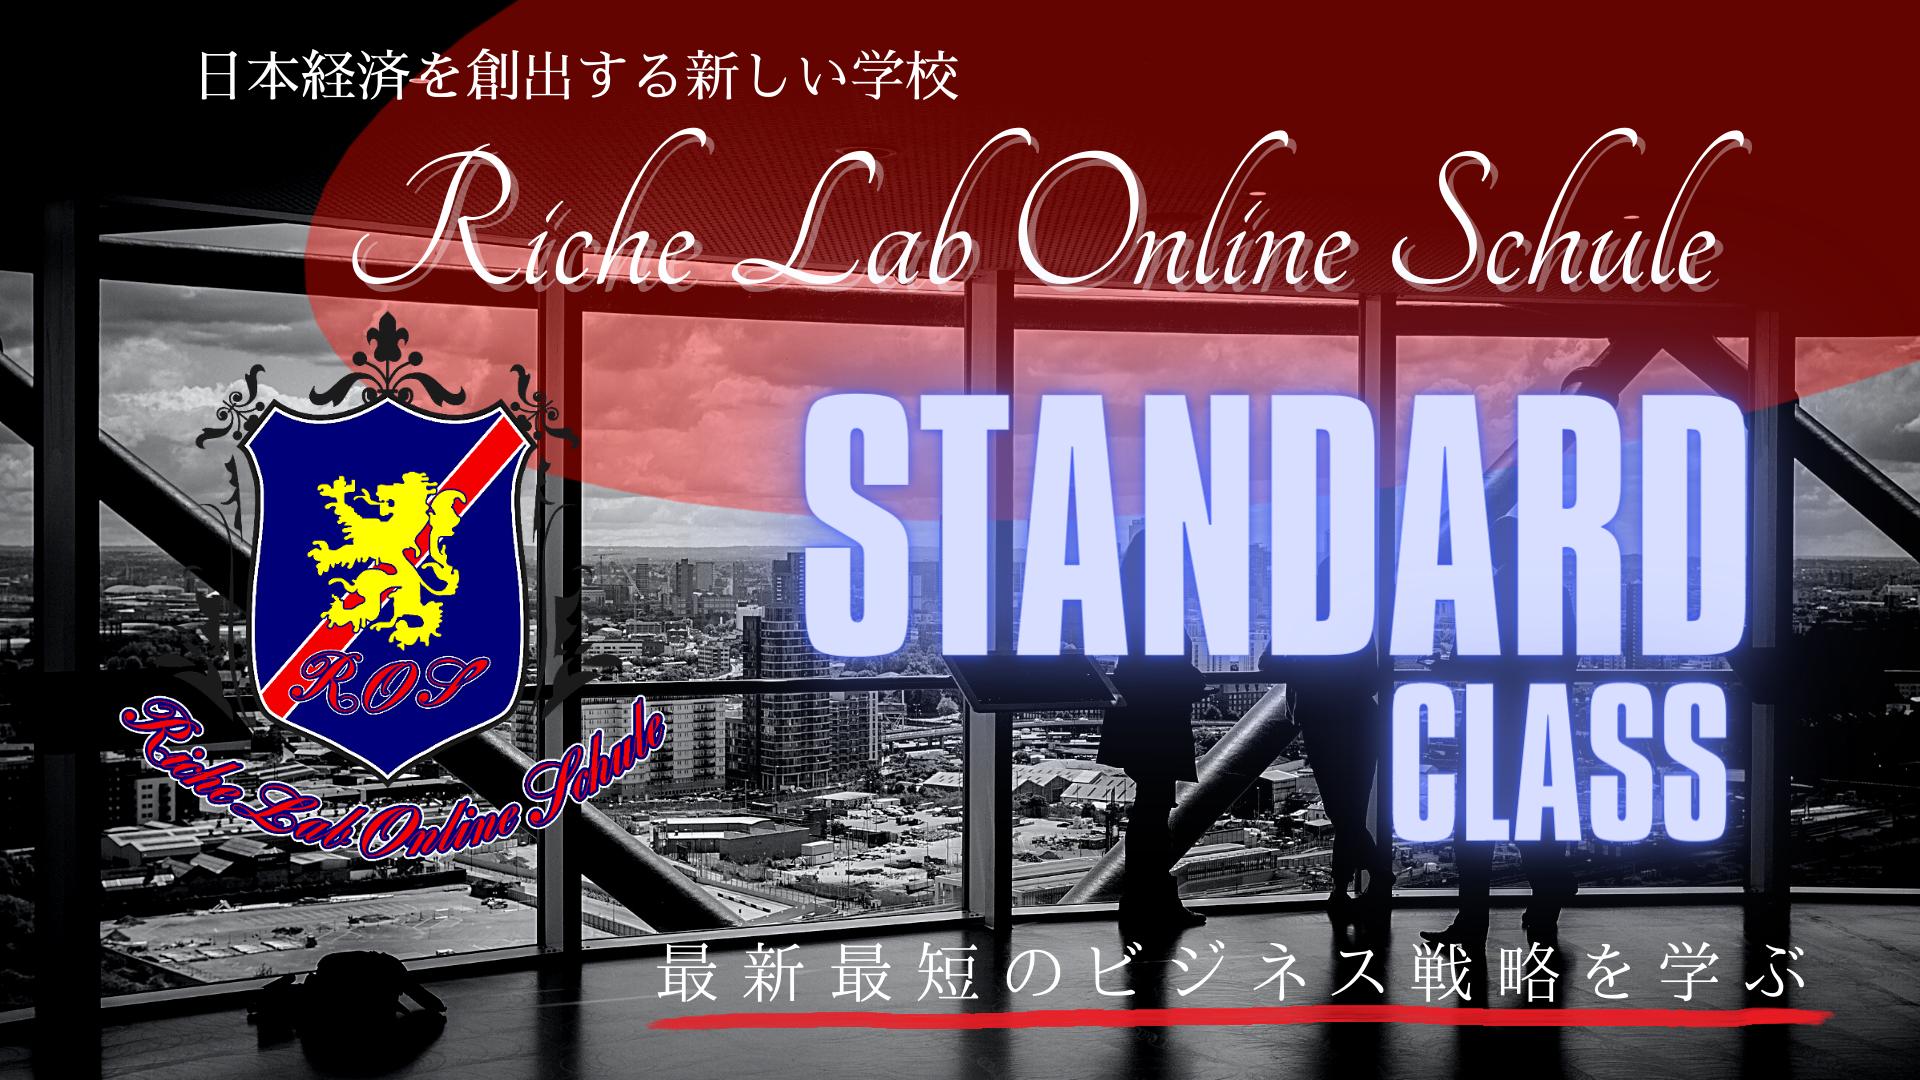 ROS(リッシュラボ・オンライン・シューレ) スタンダードクラス